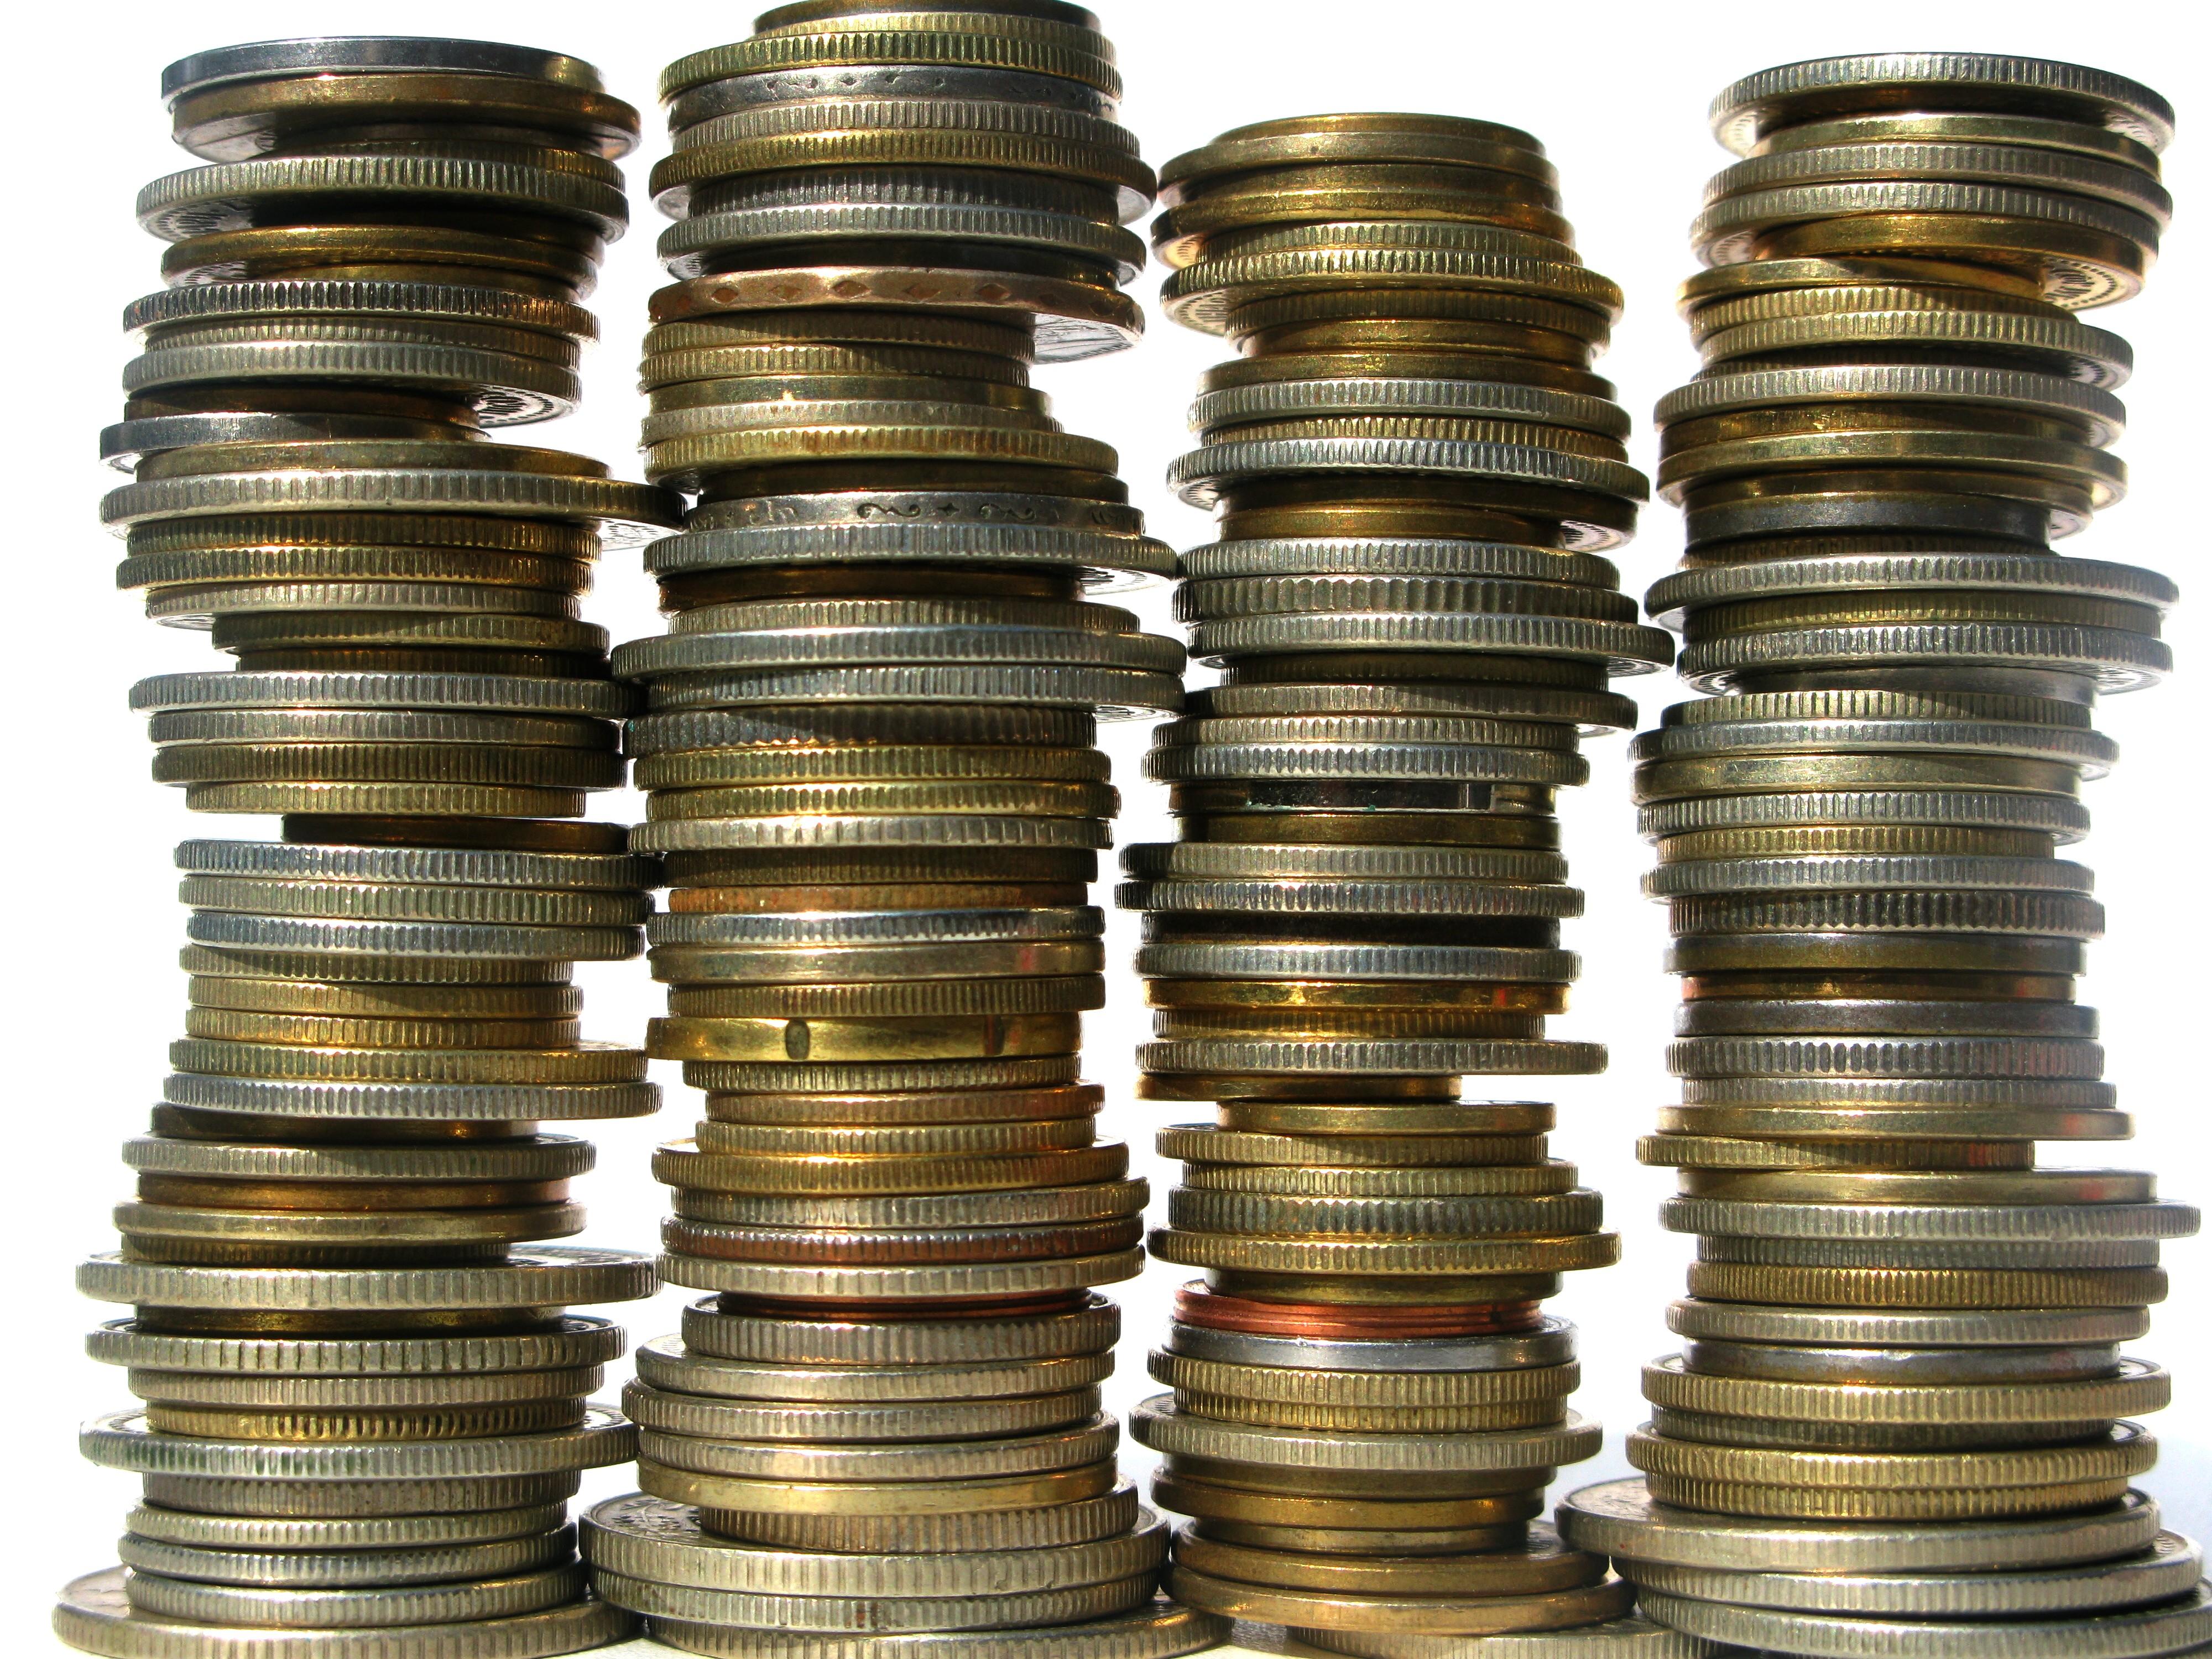 https://www.finansinesidejos.lt/wp-content/uploads/2012/01/coins.jpg